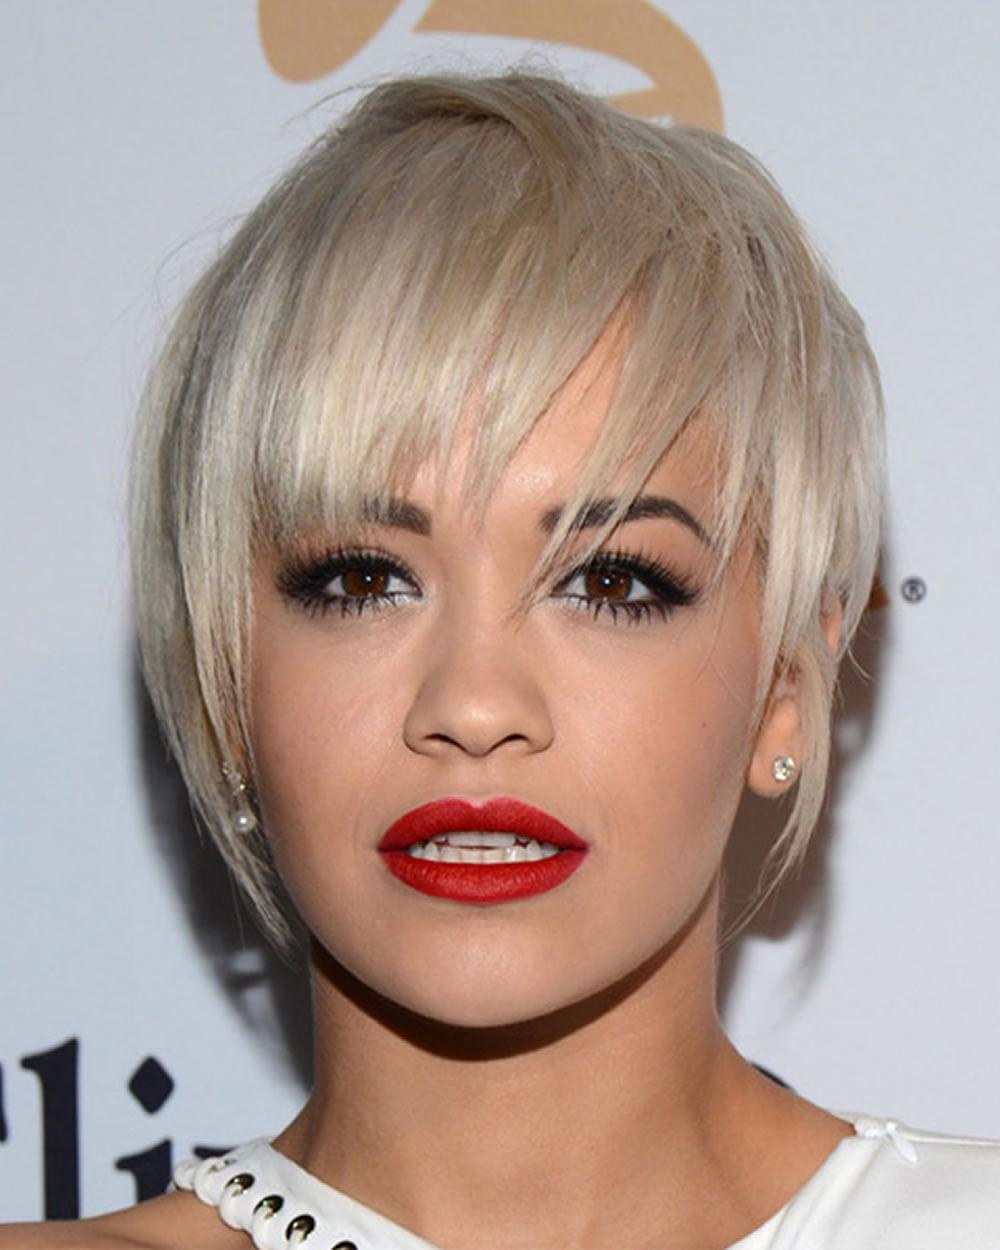 Rita Ora's Short Hairstyles (Pixie + Bob) For 2018